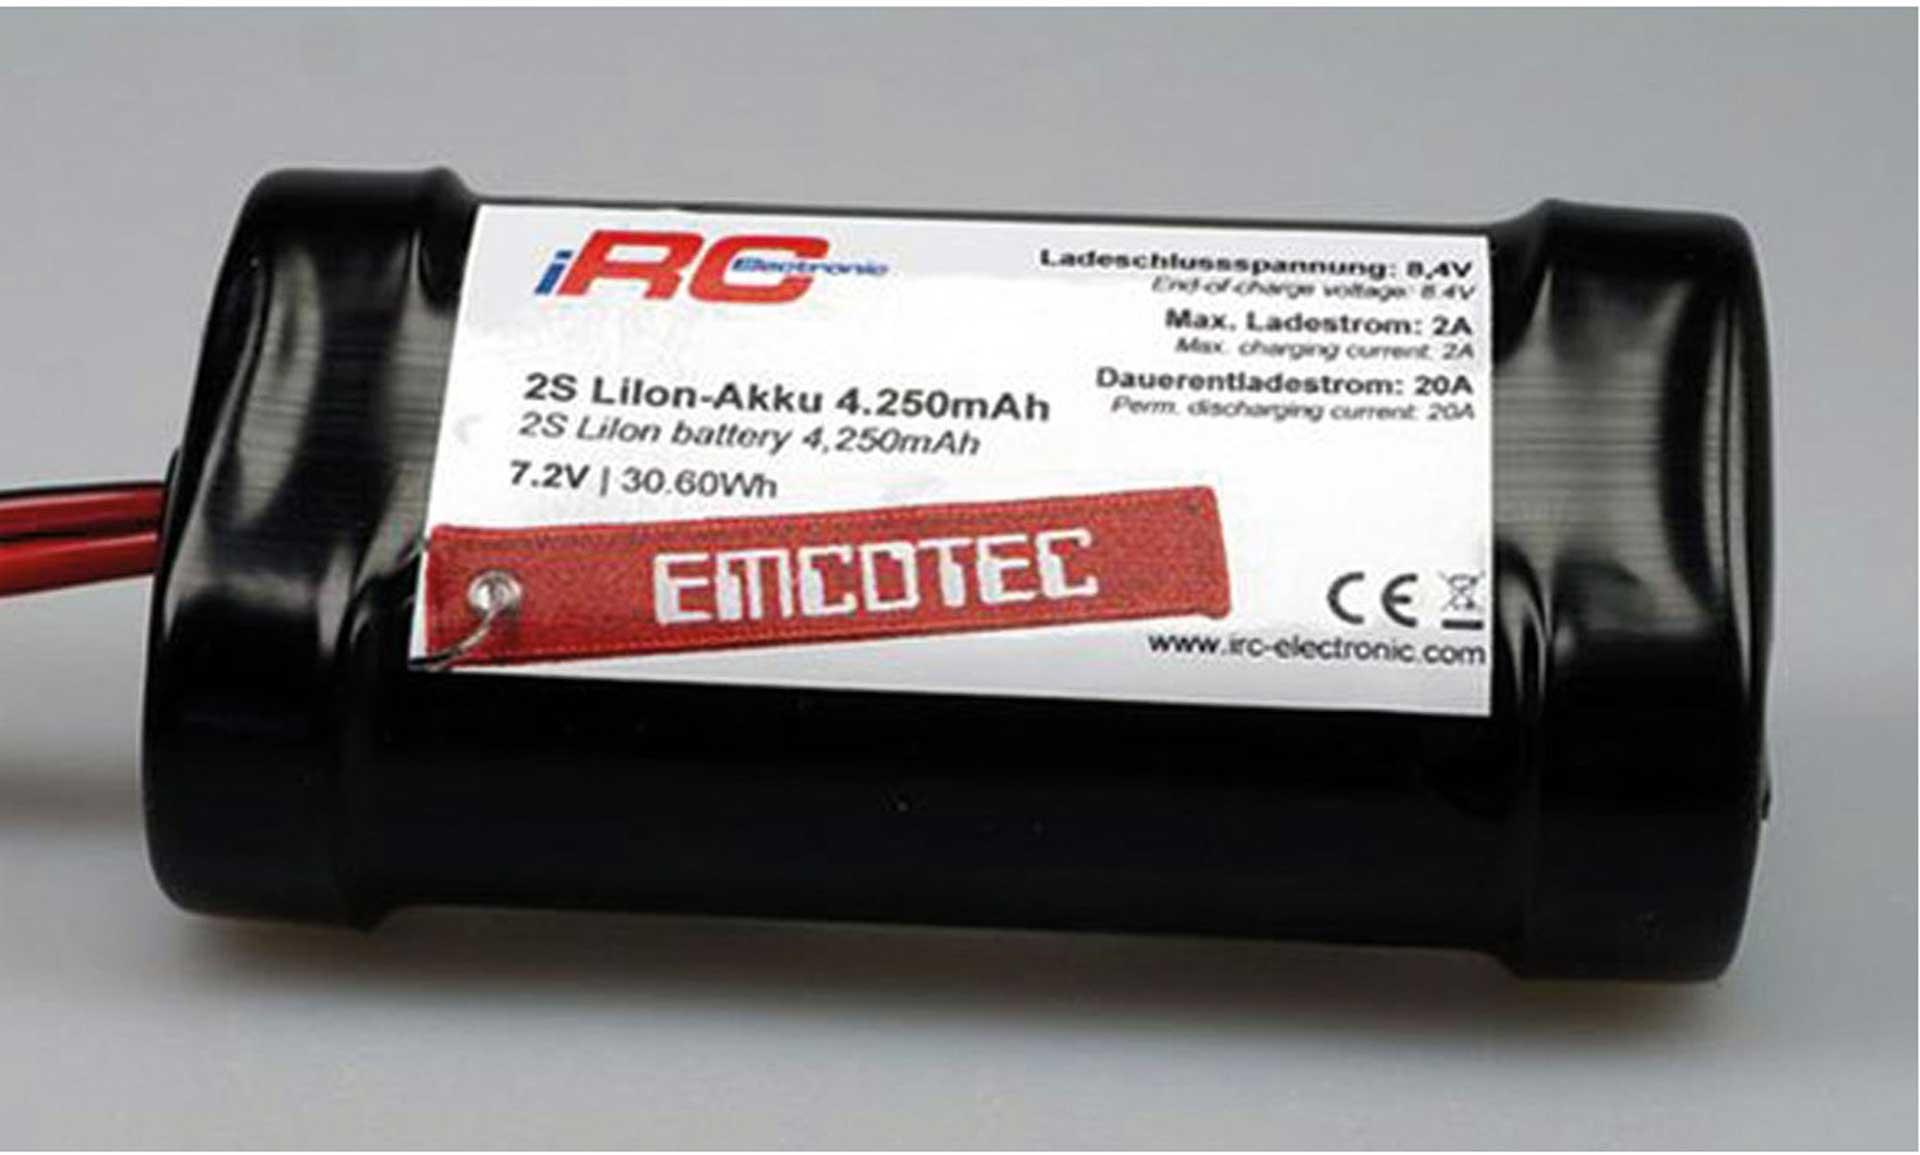 EMCOTEC E-AKKU 2S 4250MAH 7,2V MPX/JR